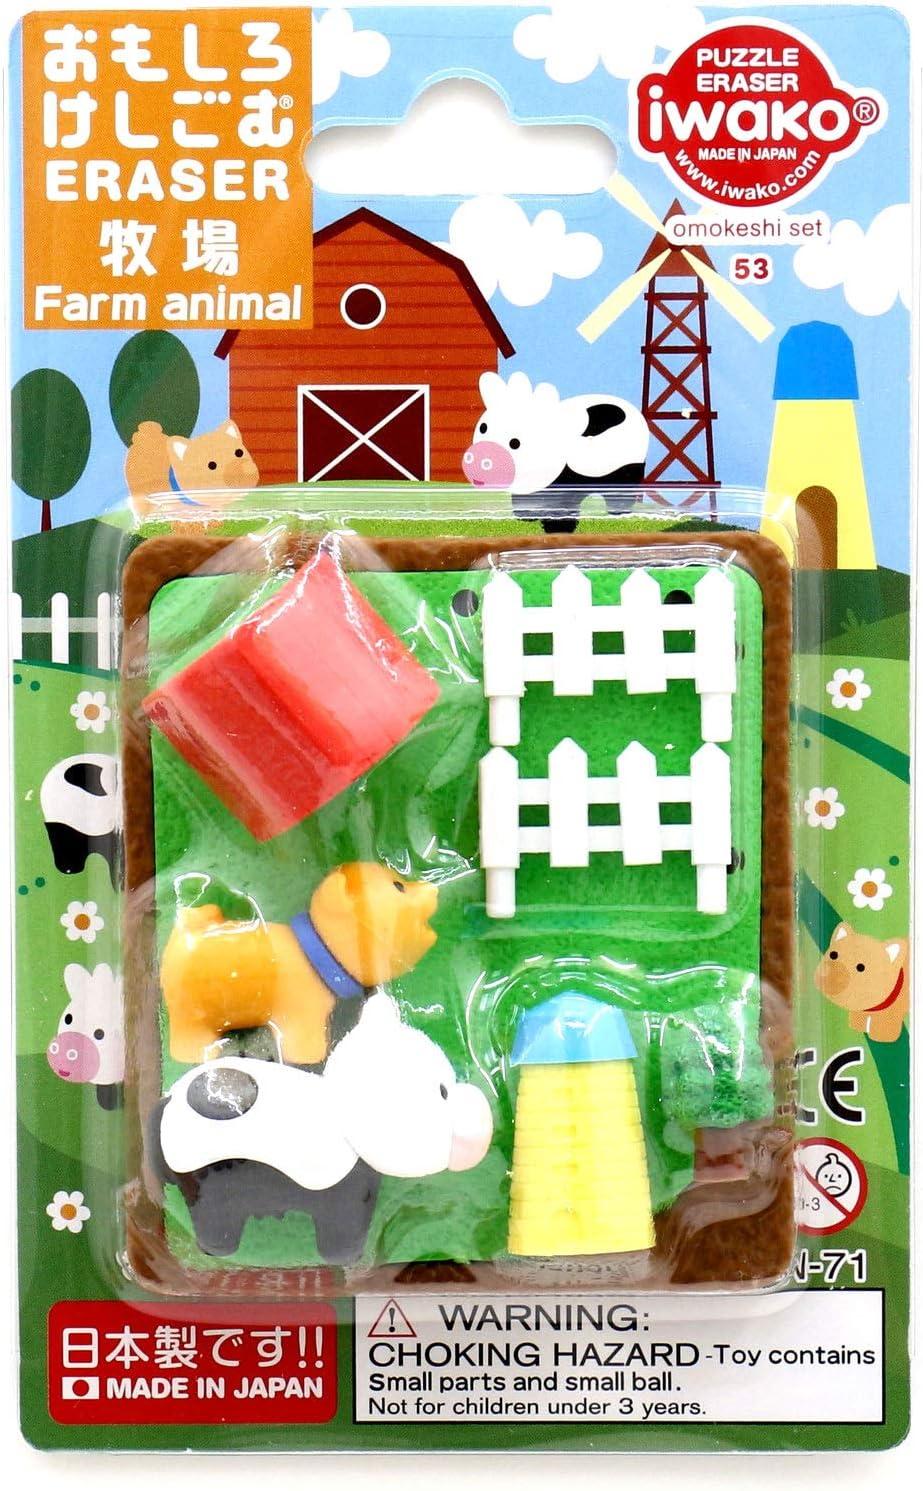 IWAKO Japanese Puzzle Erasers Safari Animals Blister Card Set